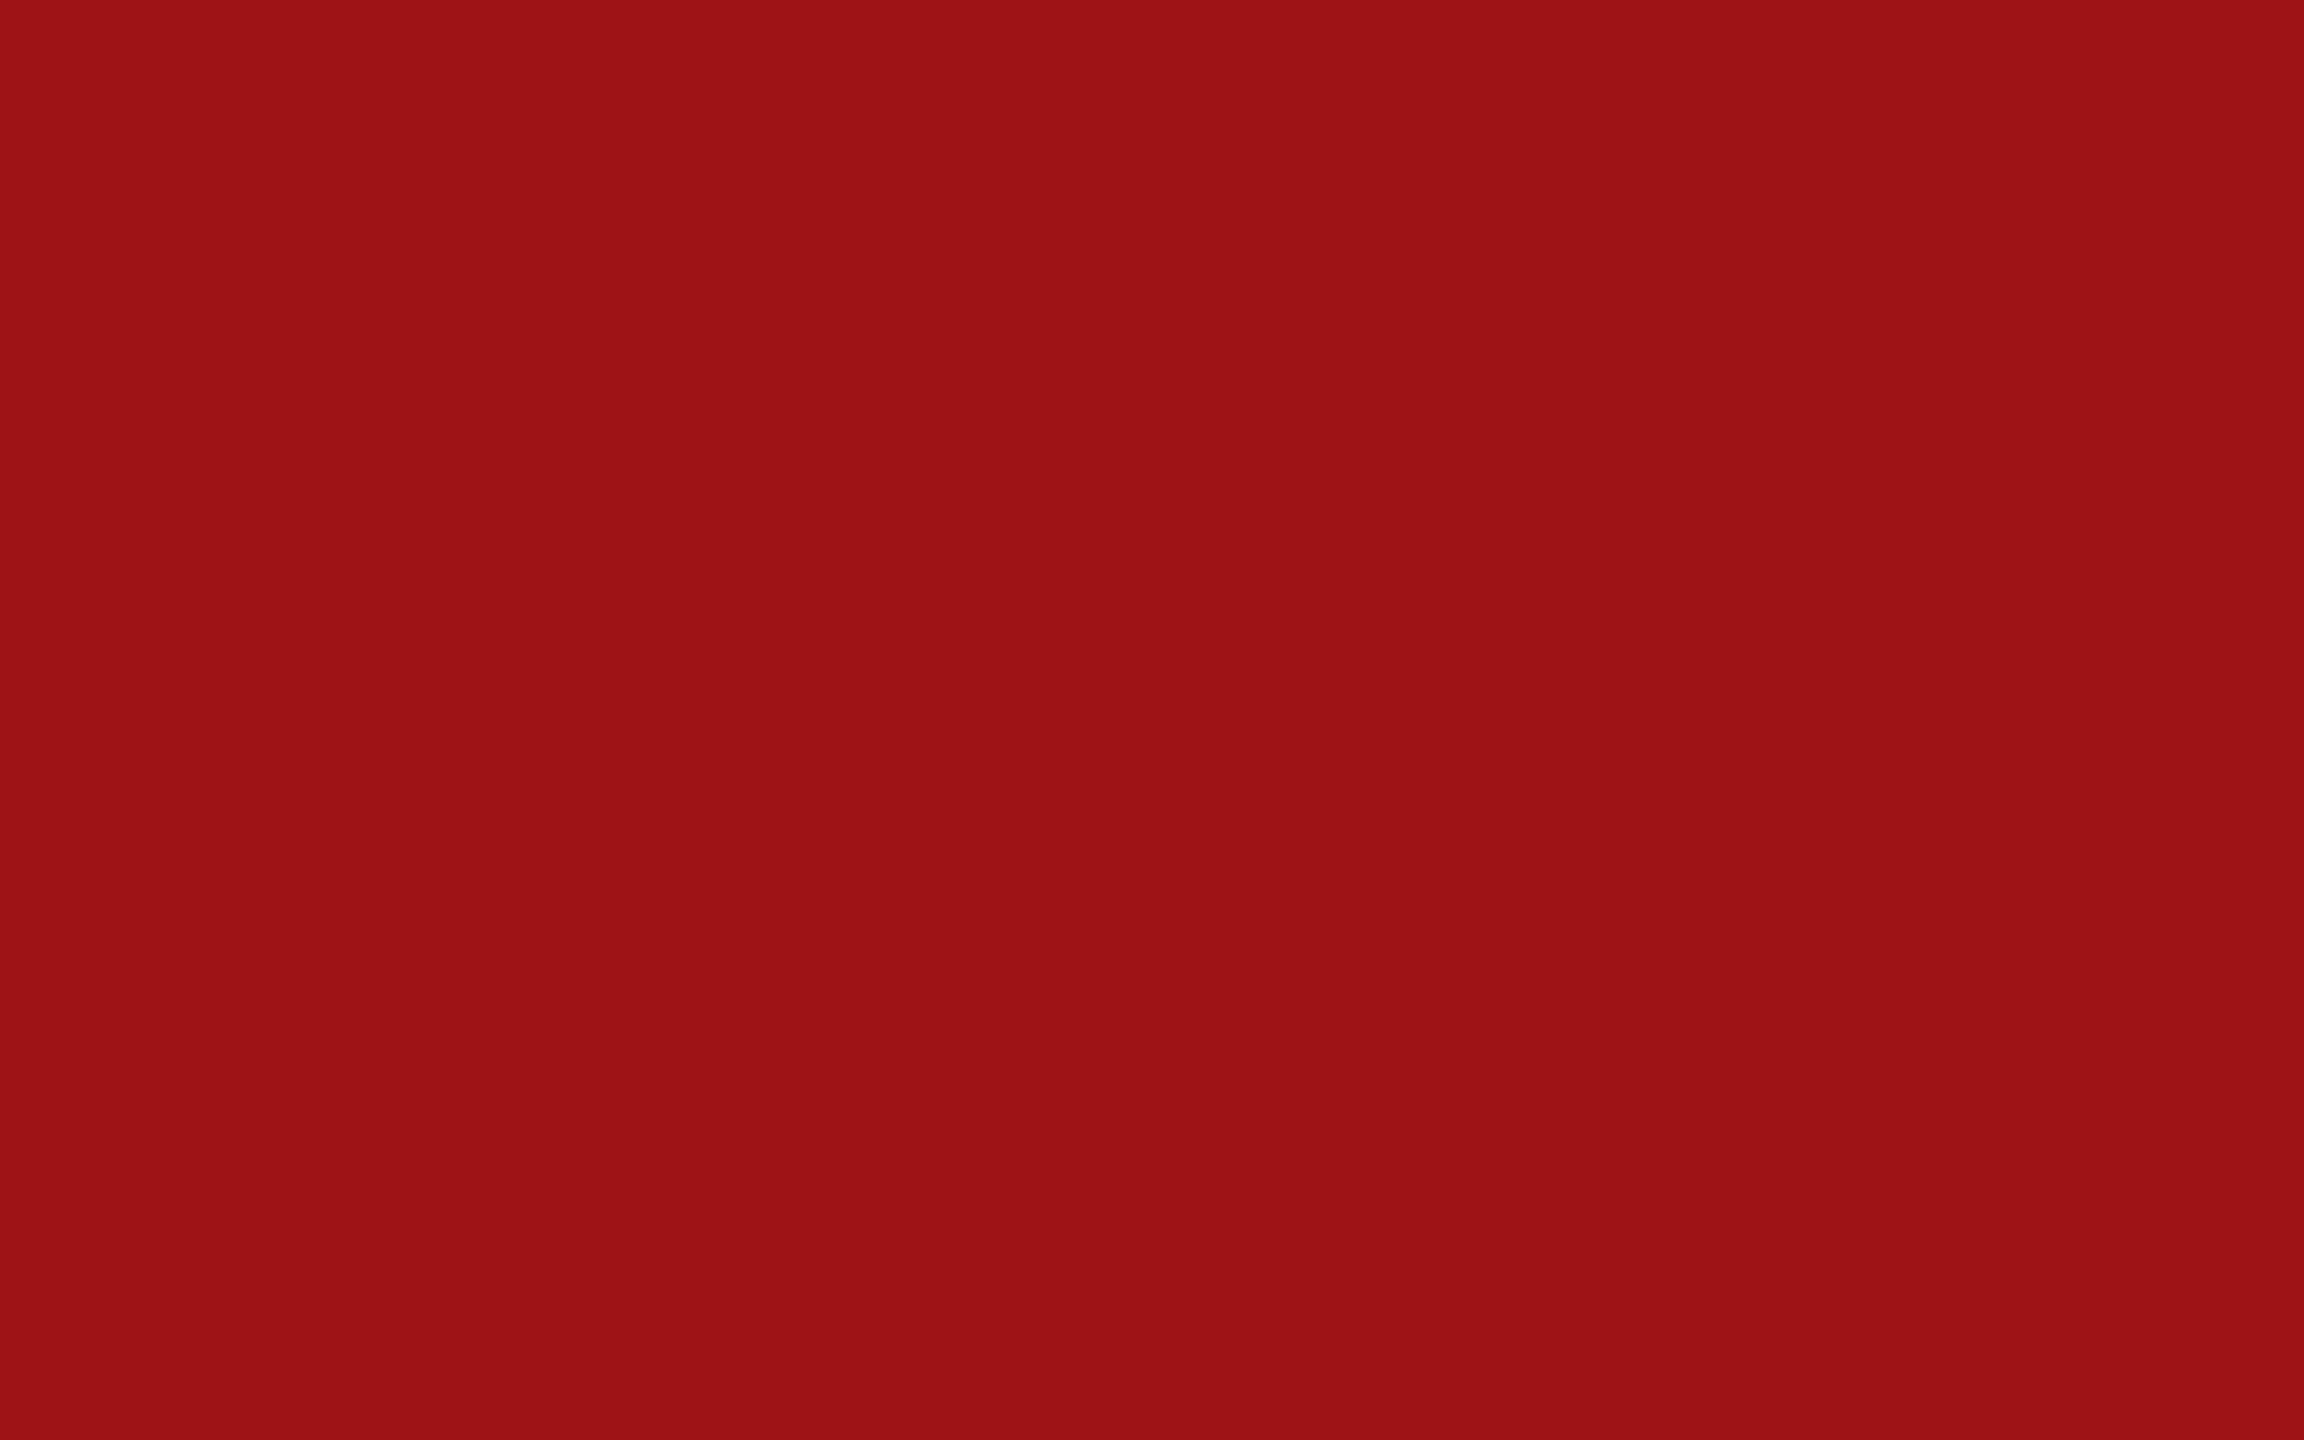 2304x1440 Spartan Crimson Solid Color Background